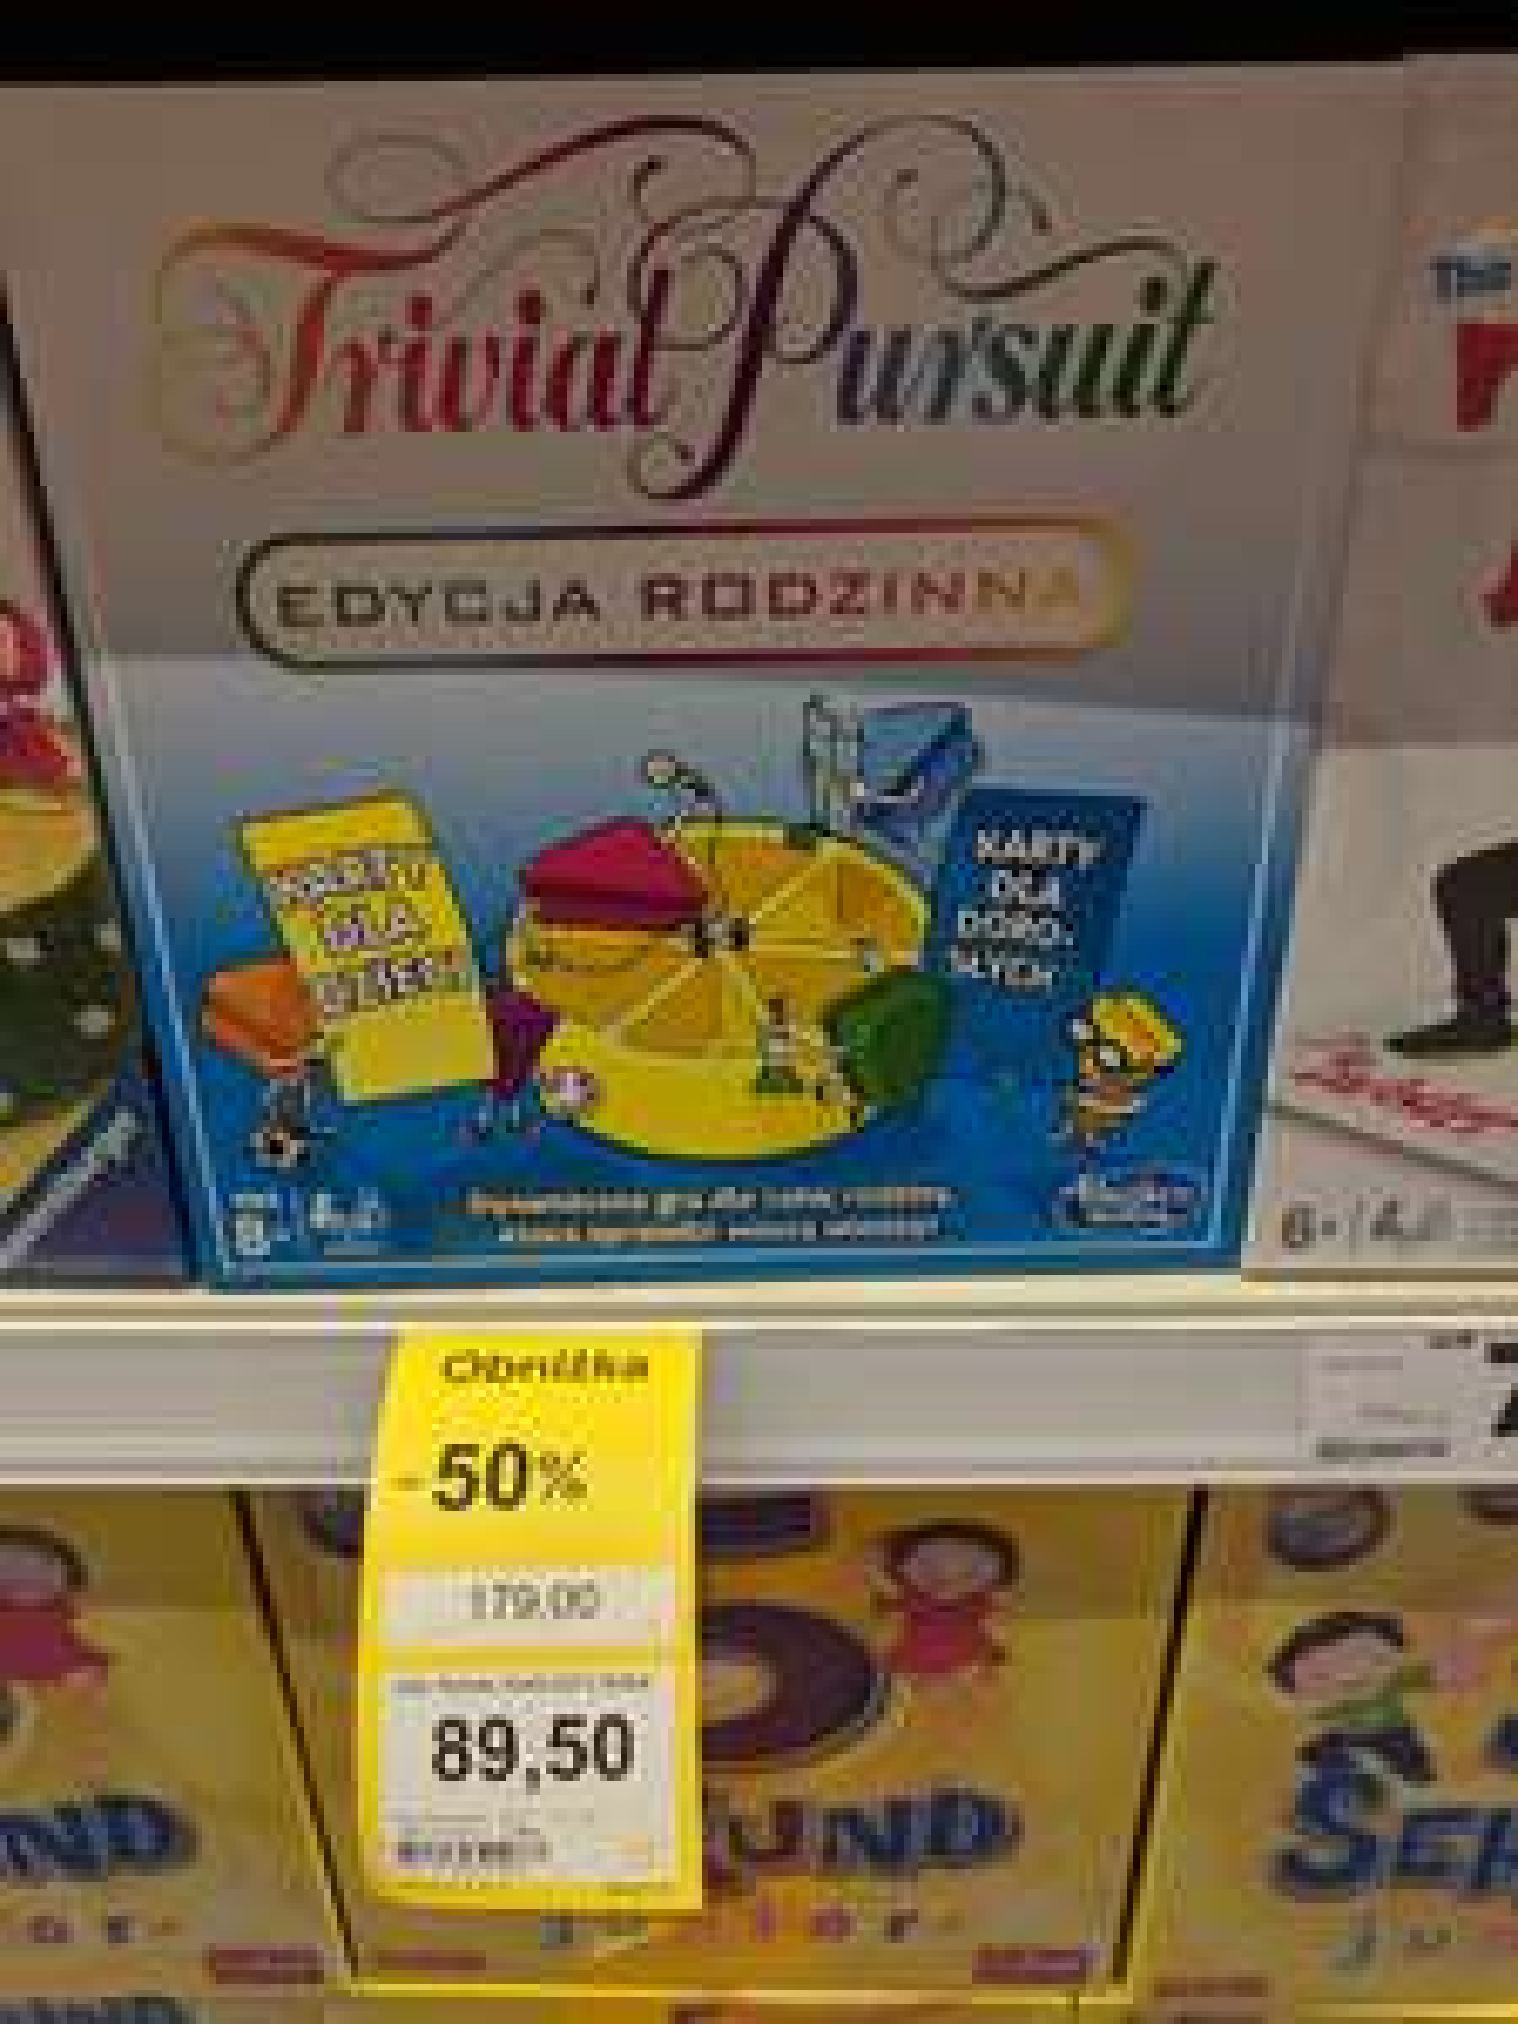 Trivial Pursuit Edycja Rodzinna